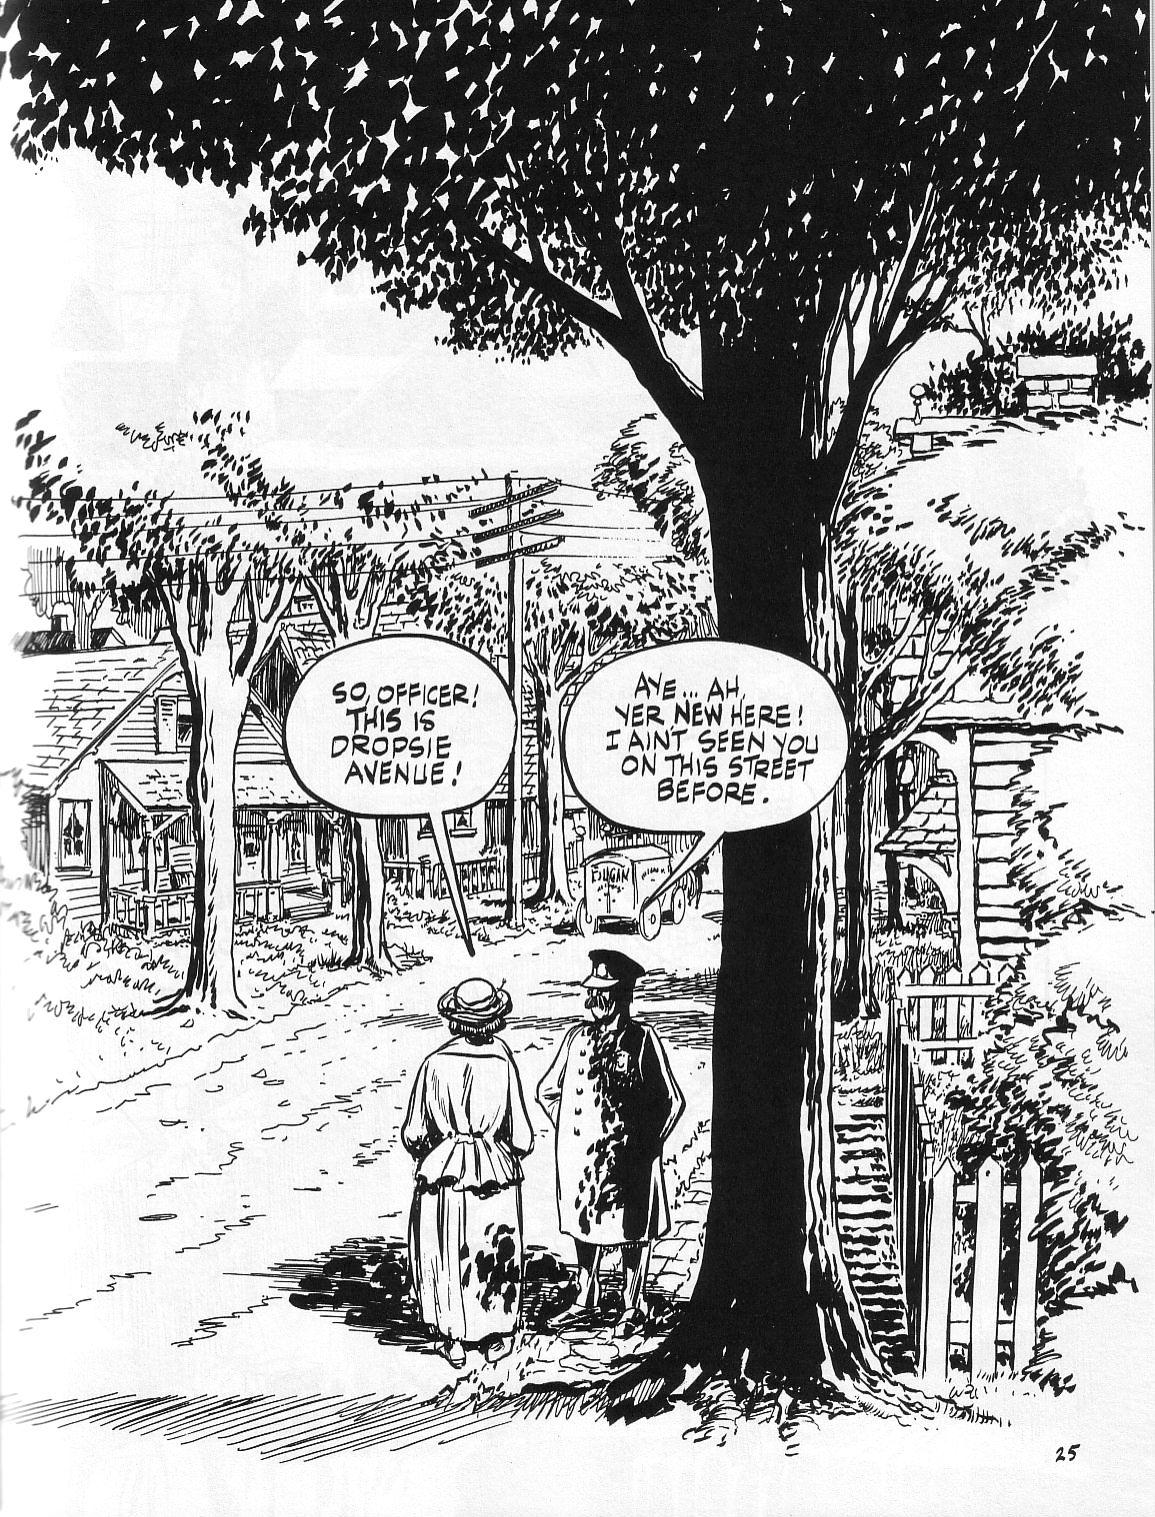 Read online Dropsie Avenue, The Neighborhood comic -  Issue # Full - 27